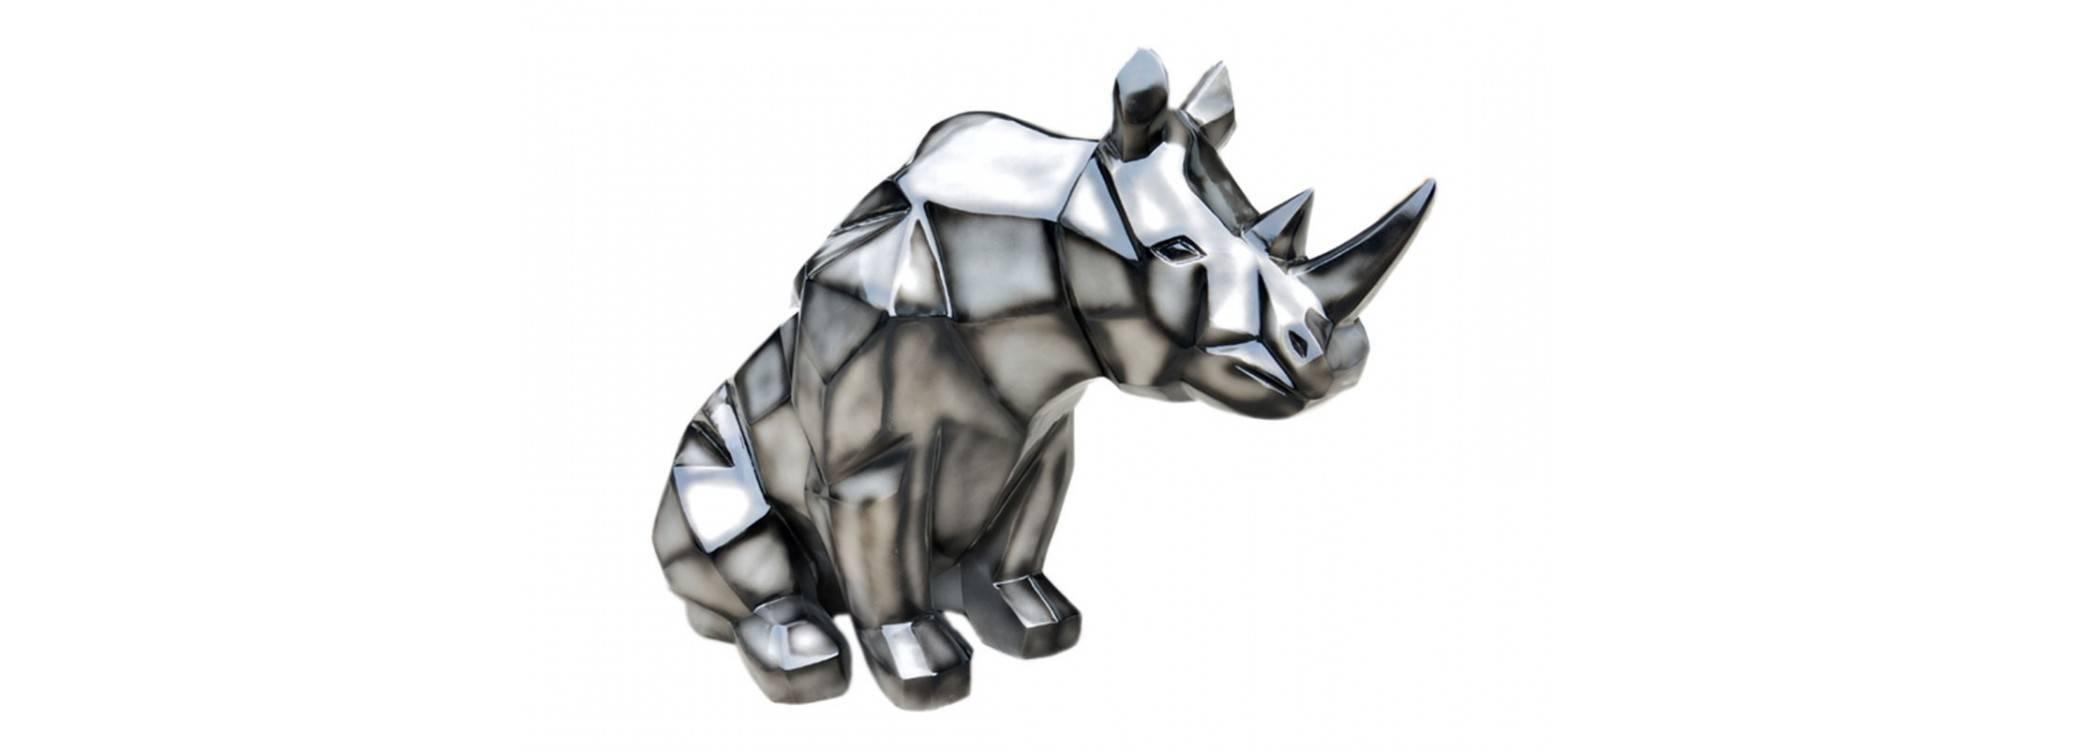 Rhinoceros statue in resin